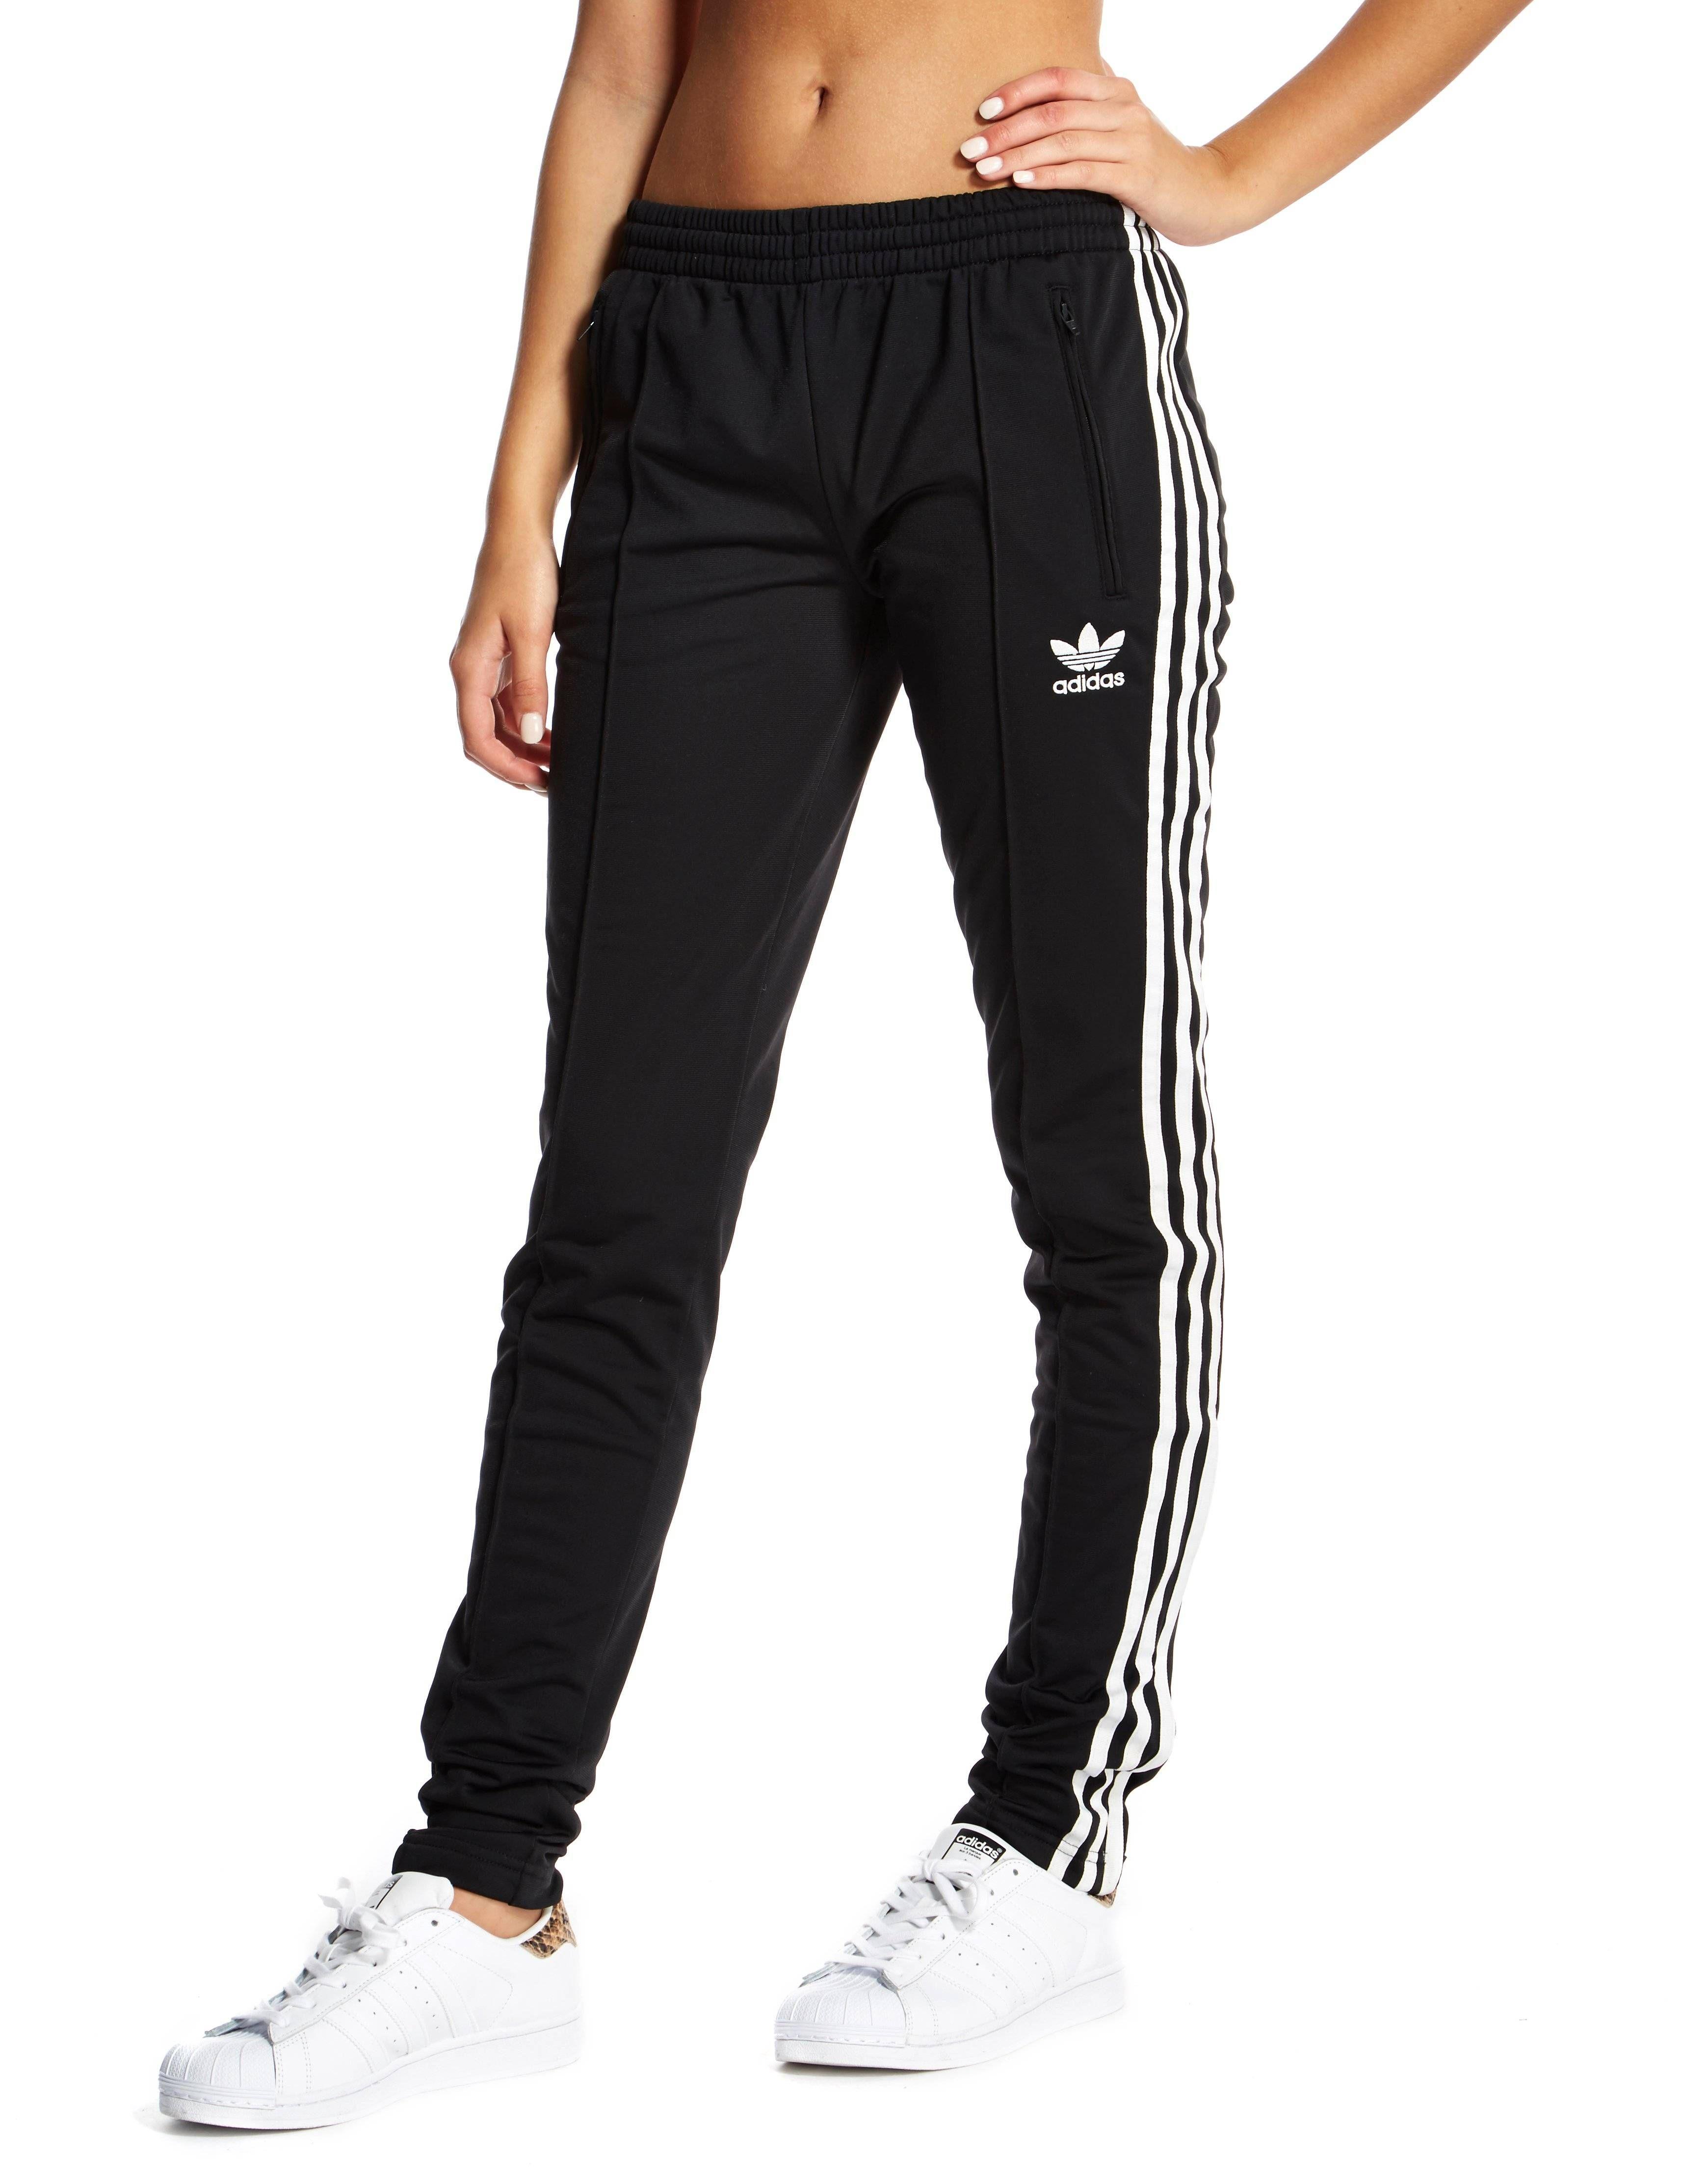 43c6228dc fake vs real yeezy boost 350 adidas pants women tiro 15